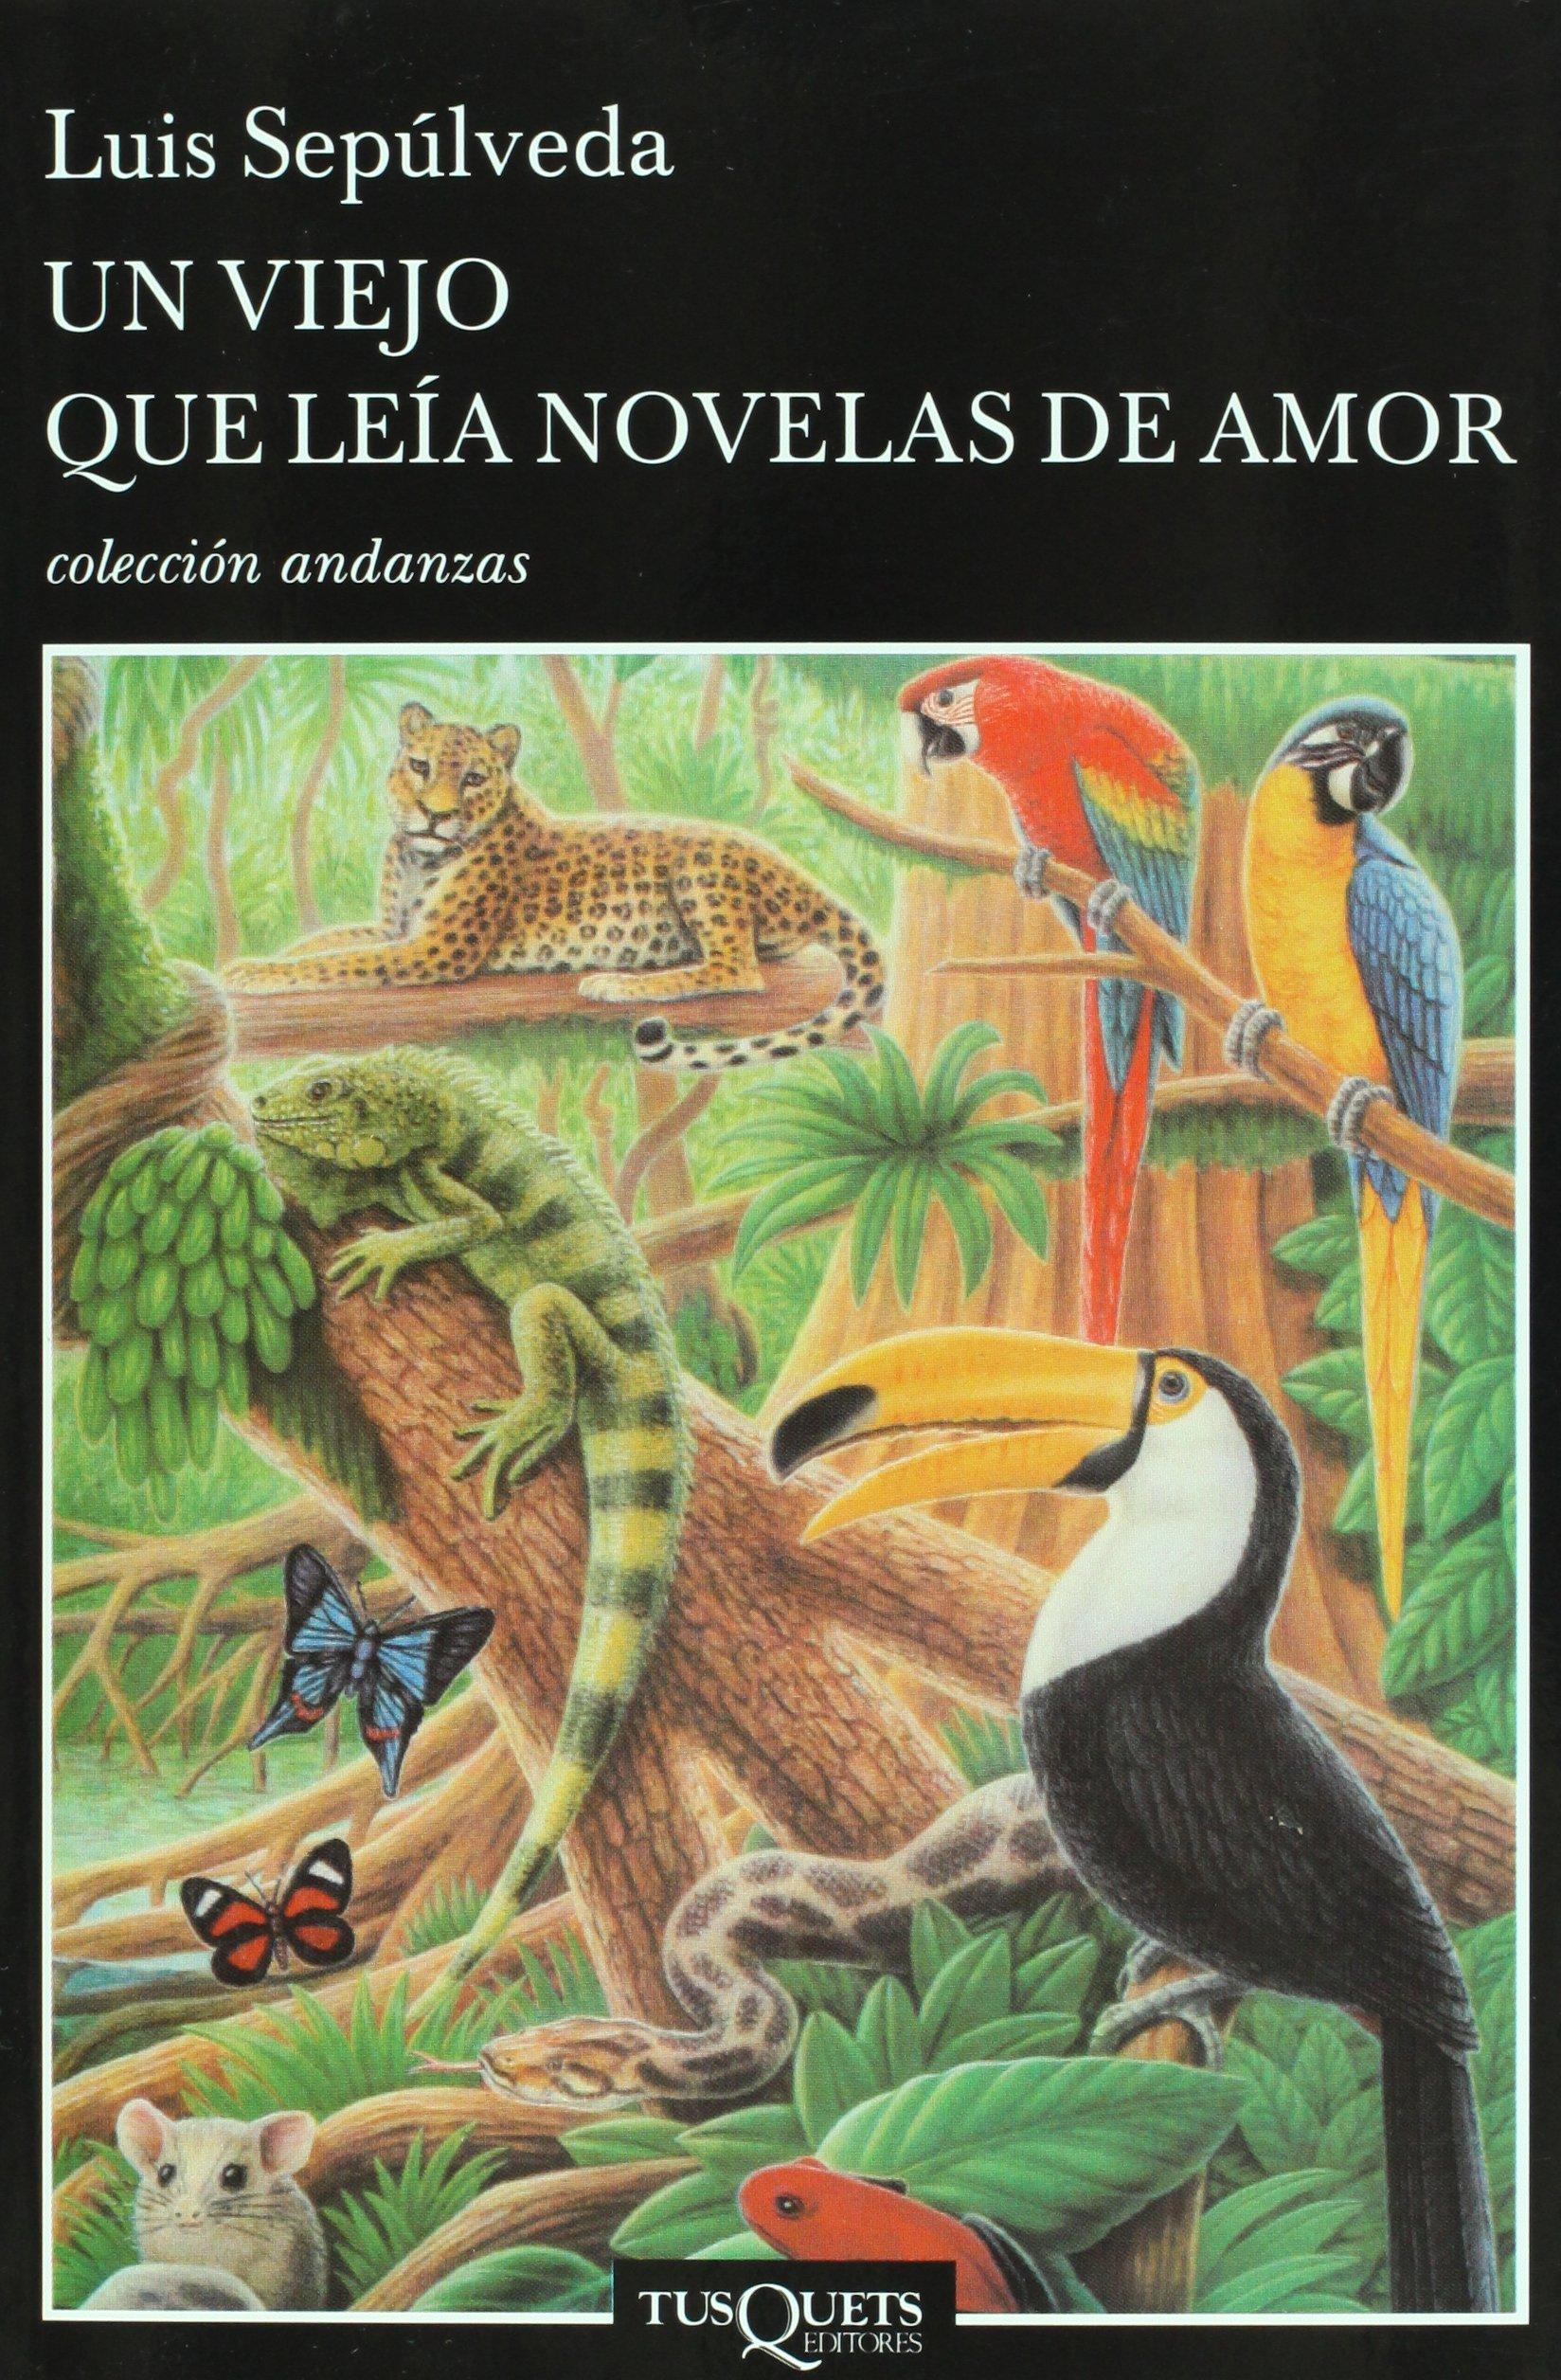 Un viejo que leia novelas de amor (Spanish Edition): Luis Sepulveda: 9789687723105: Amazon.com: Books